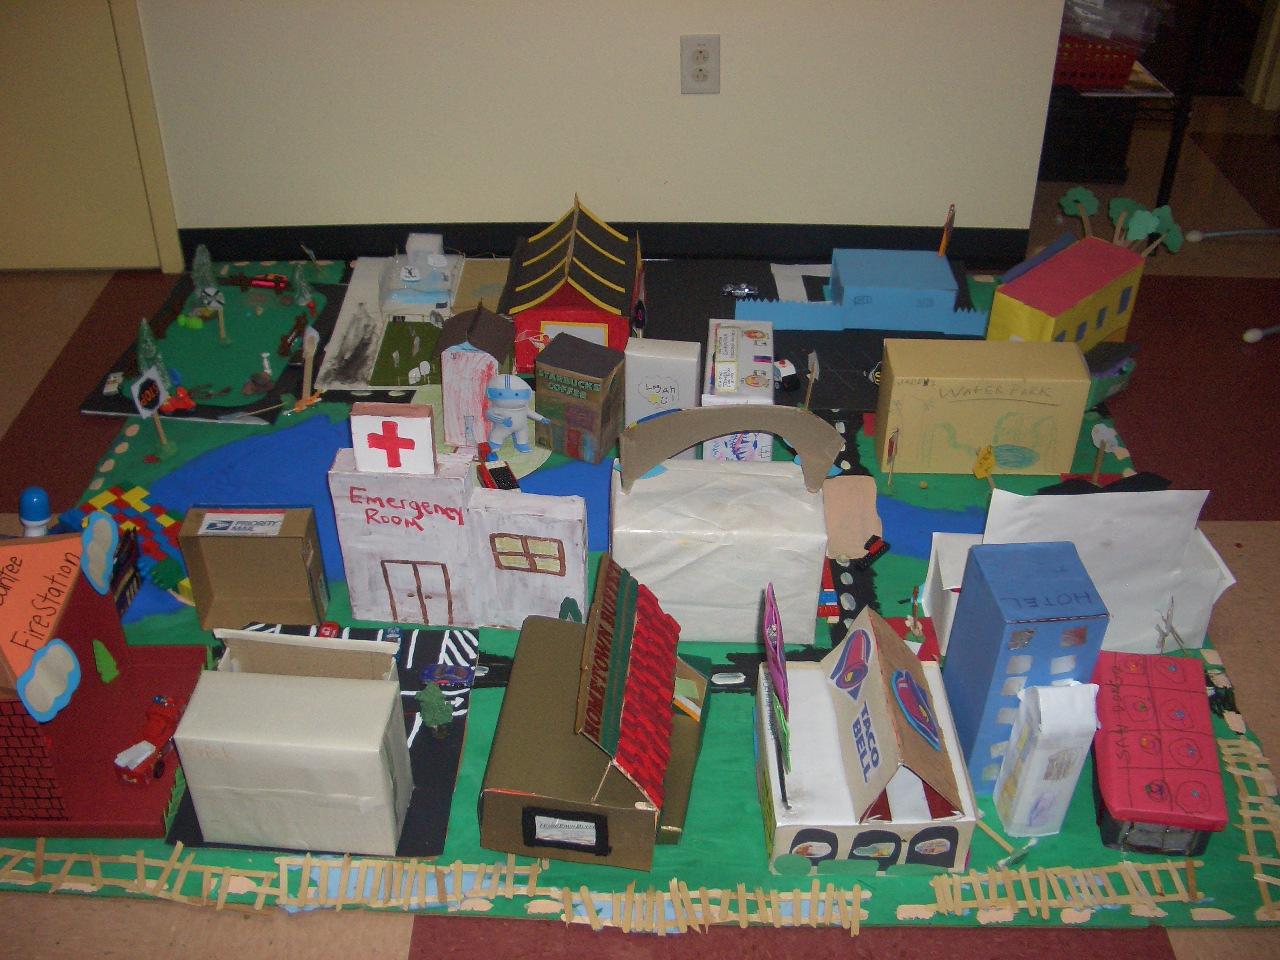 Kinderworld Project Based Learning